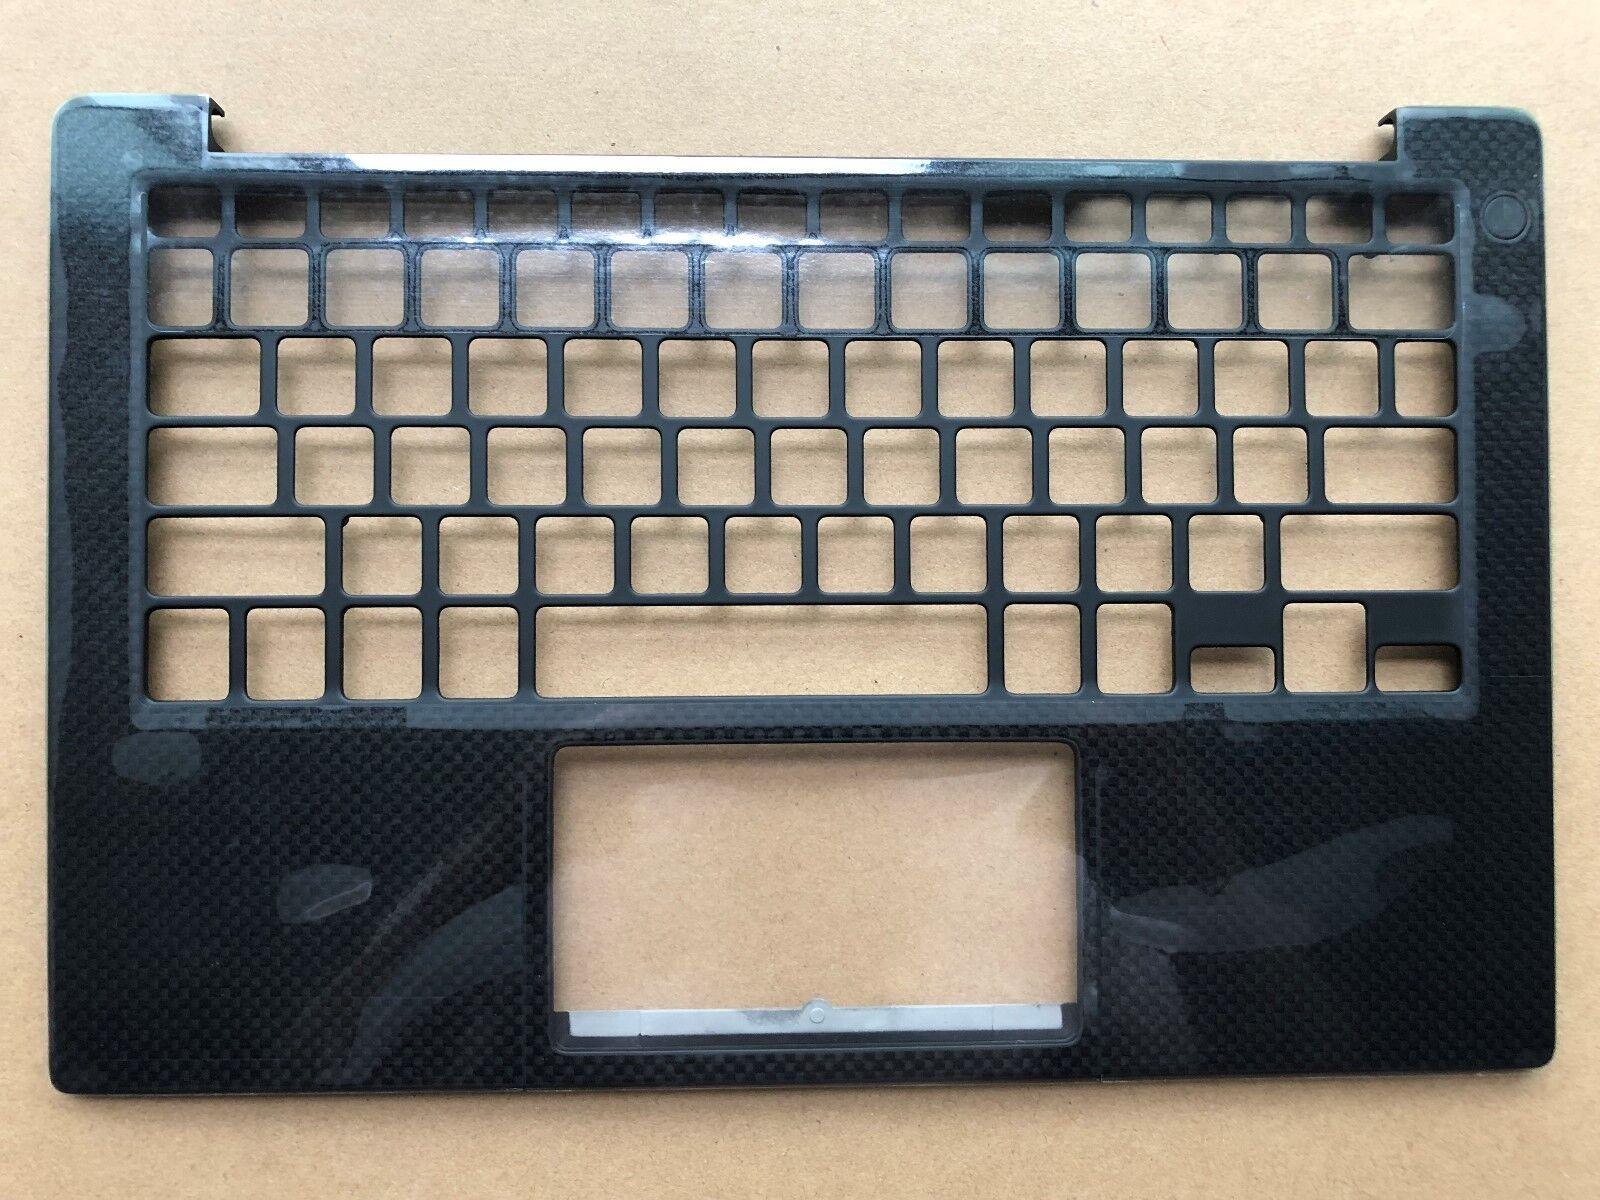 43WXK  NEW GENUINE Dell XPS 9350 9360 Laptop Palmrest CHC03 X54FF AQ1FJ000141